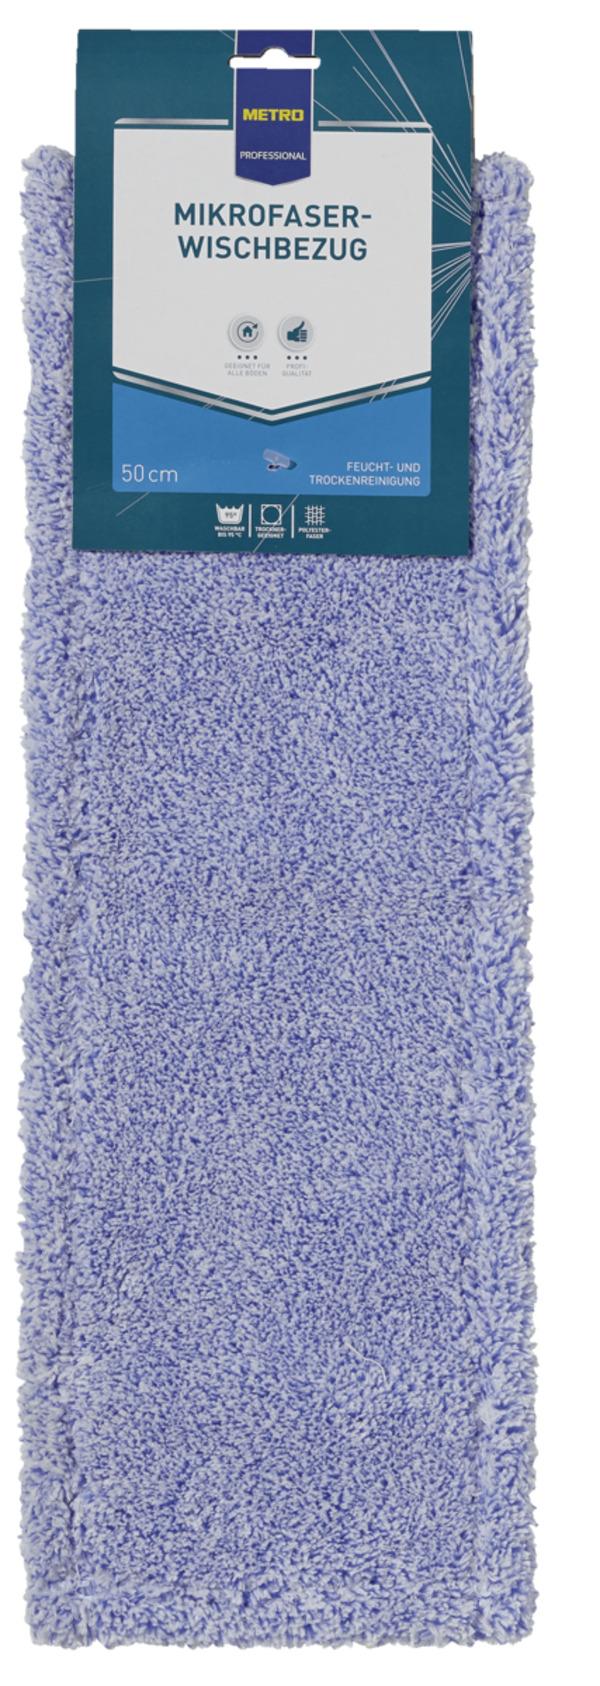 METRO Professional Microfaser Wischbezug